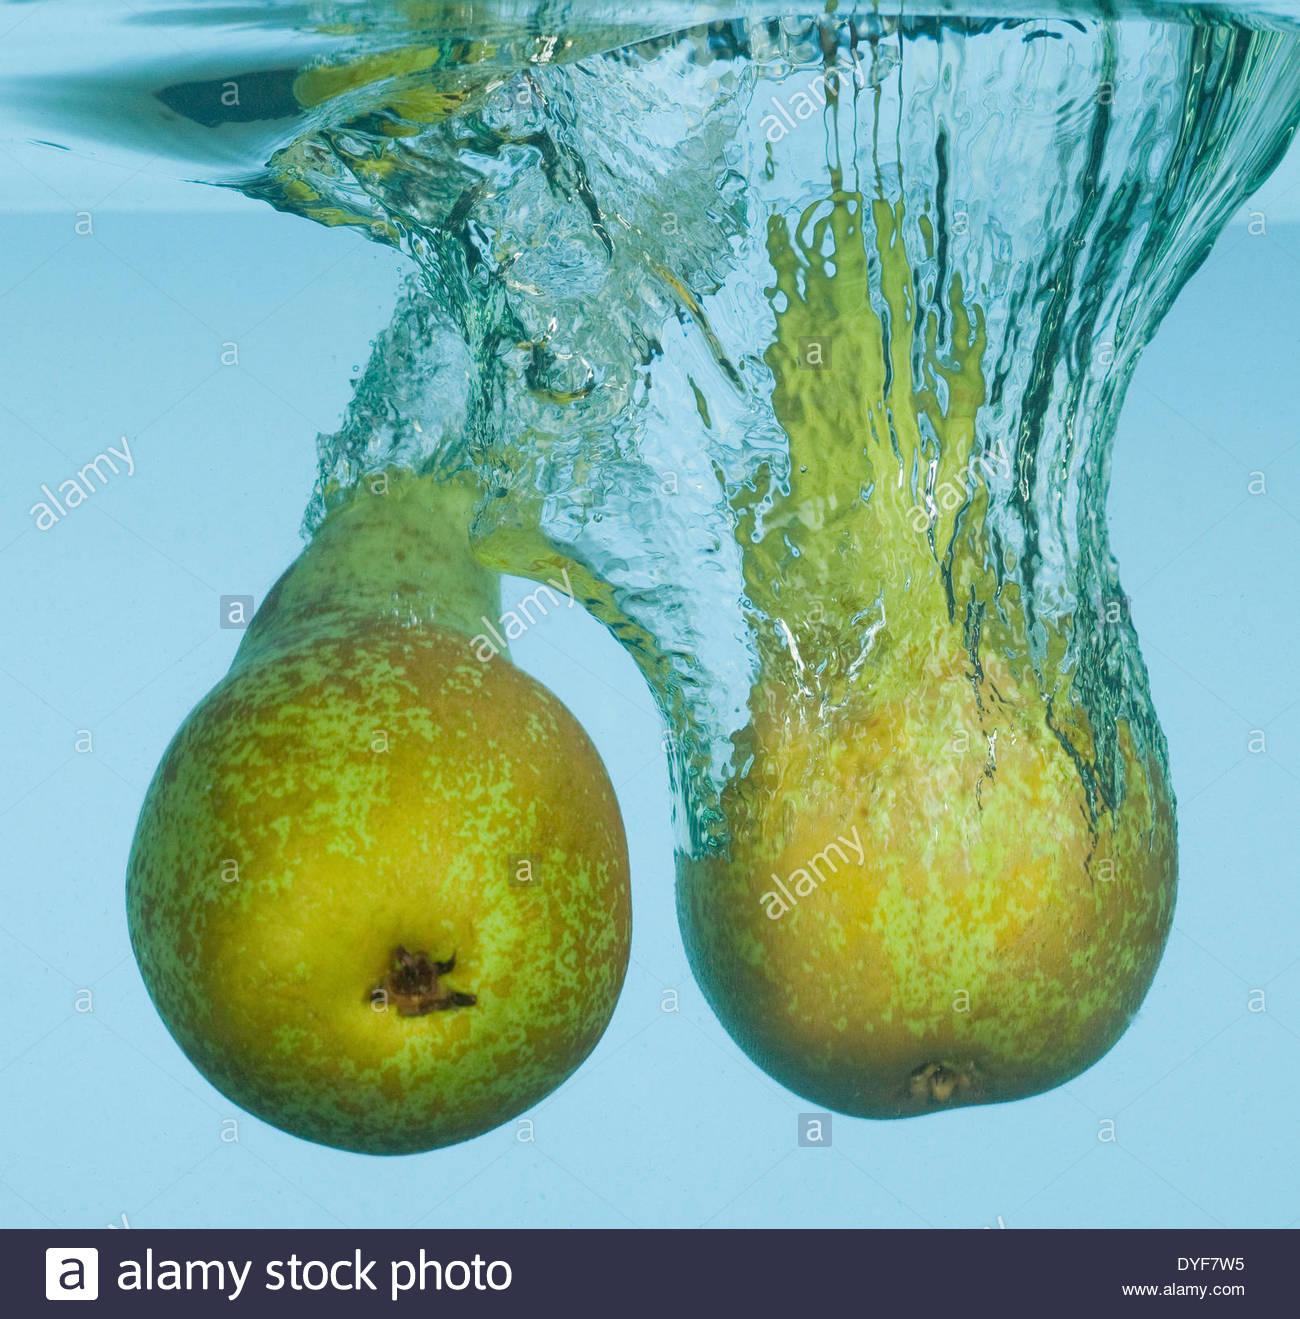 Les poires splashing in water Photo Stock